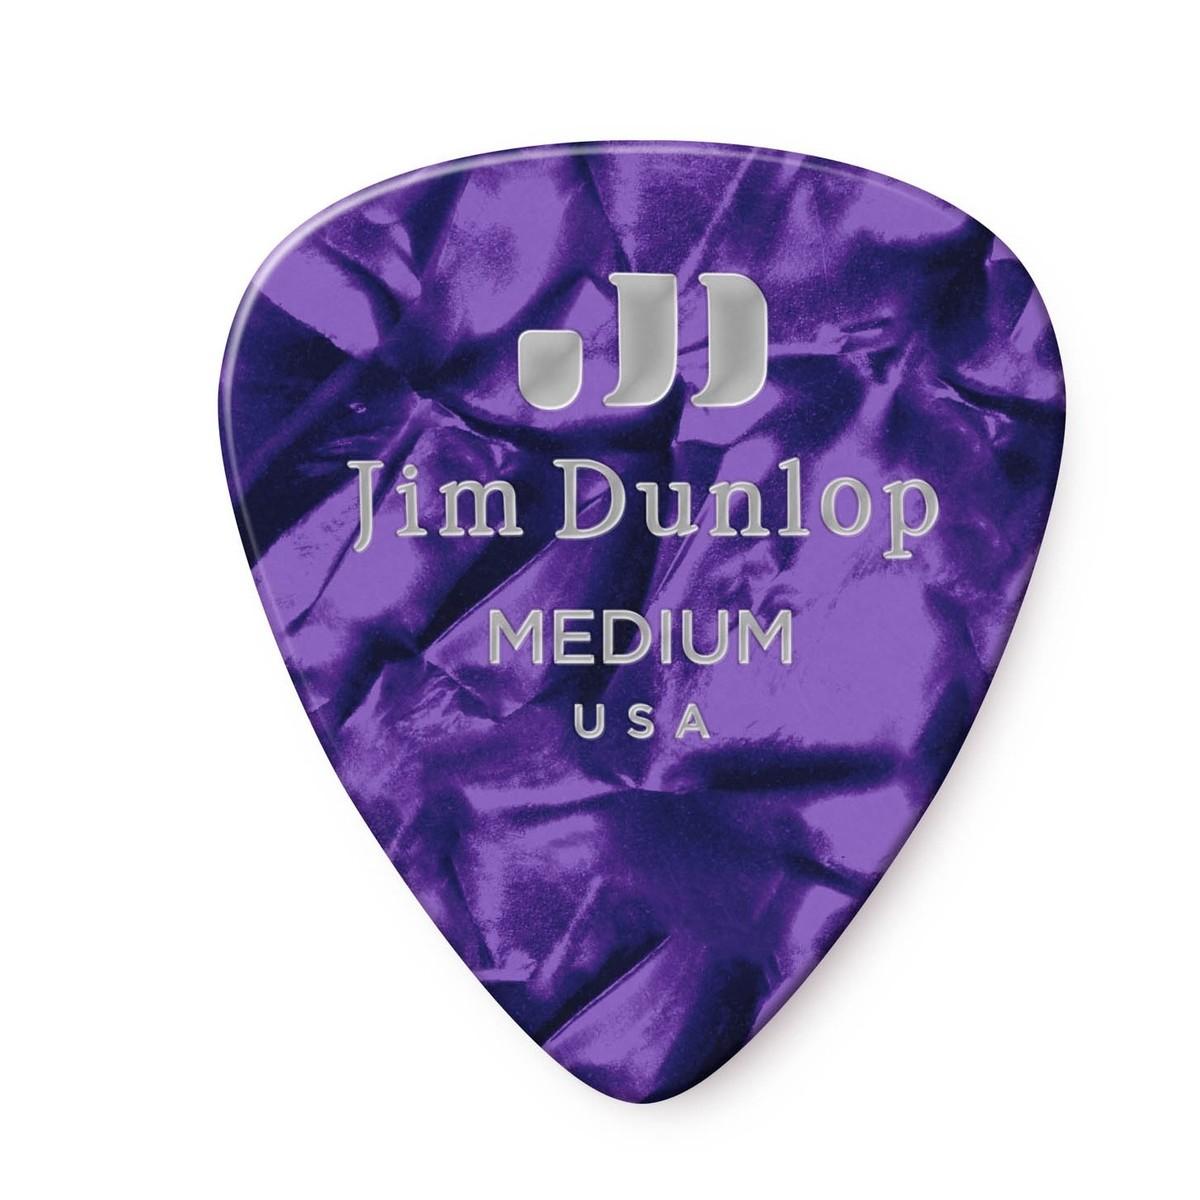 Dunlop Guitar Picks  12 Pack  Celluloid  Purple Pearl  Heavy